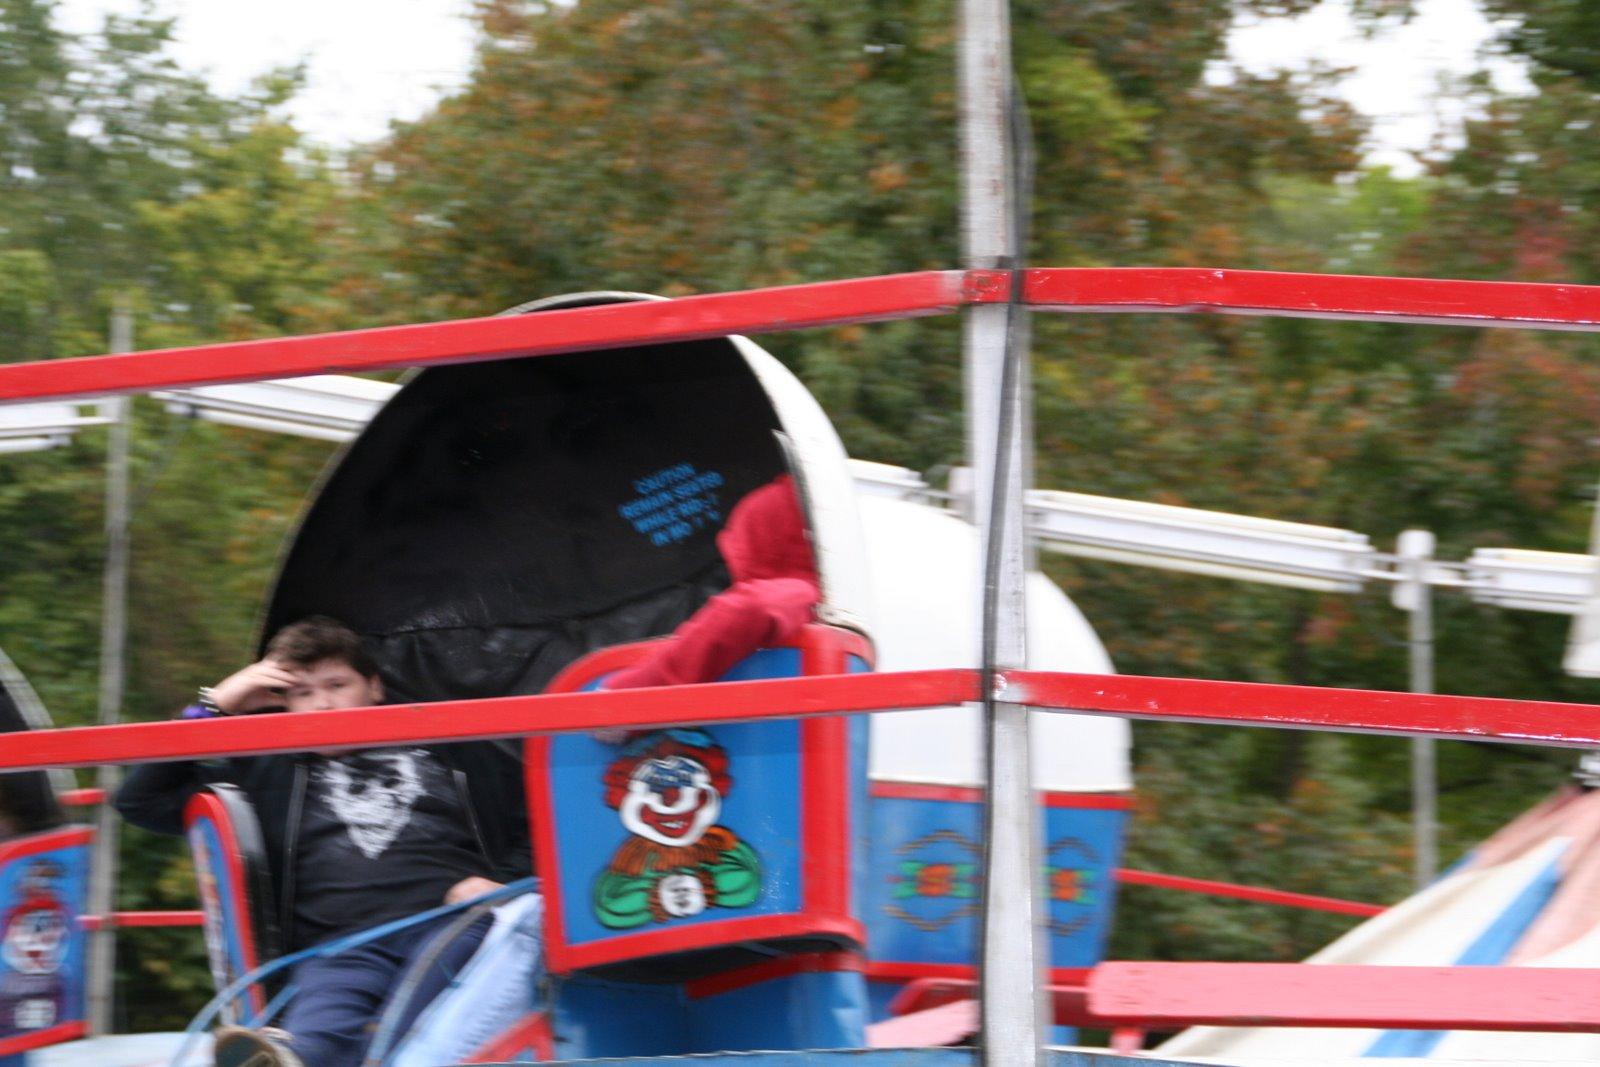 carnival-rides-42